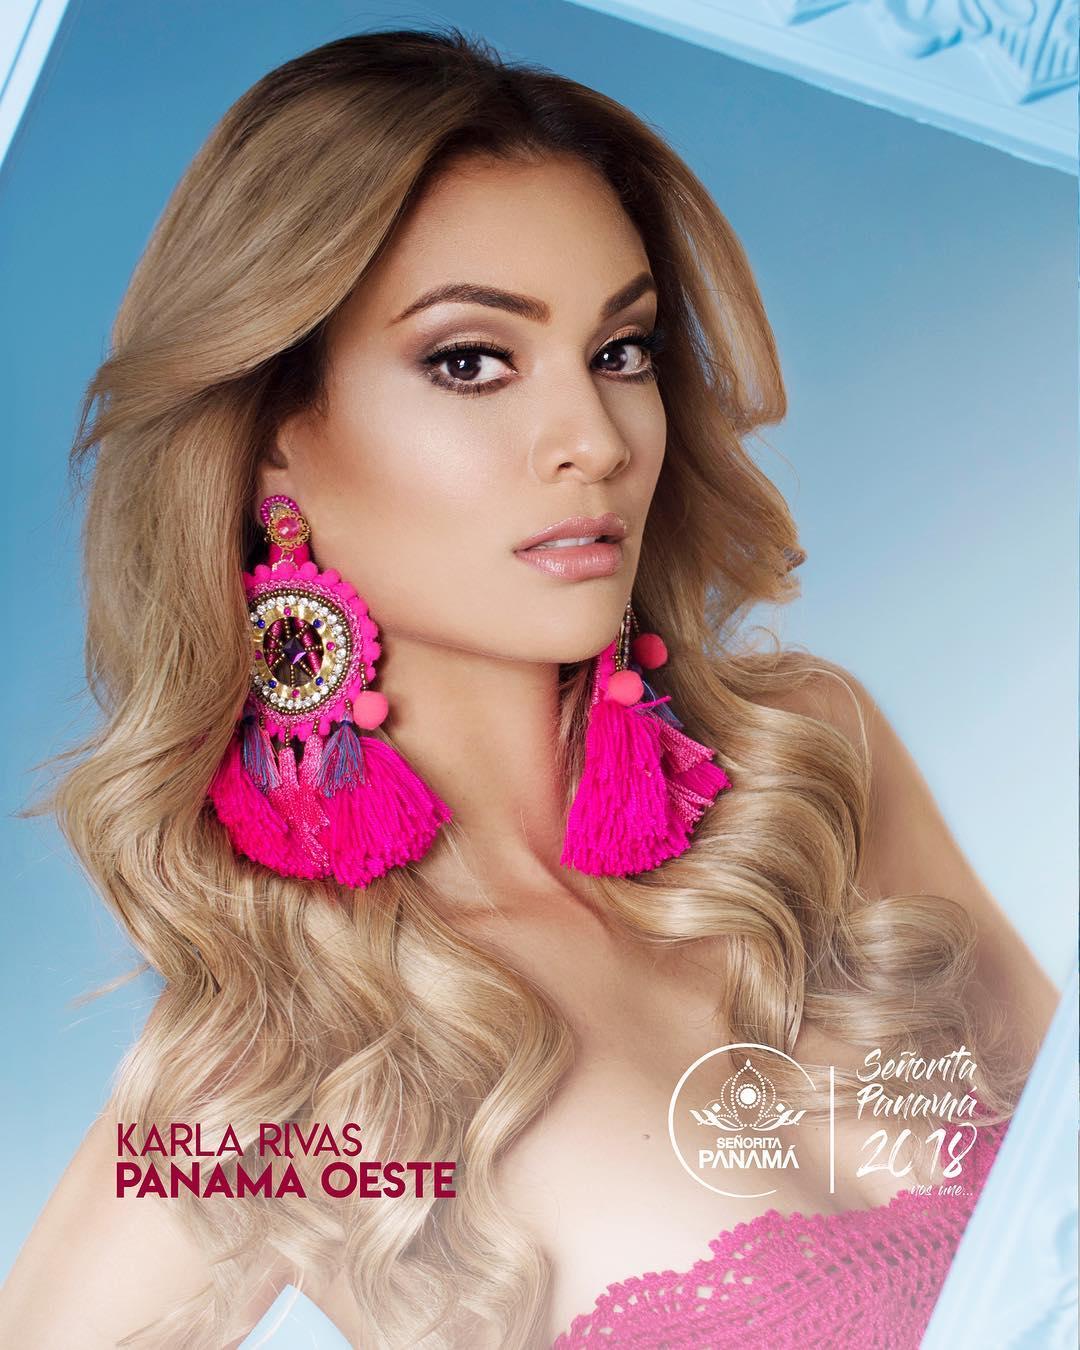 señorita miss colombia 2018 candidates candidatas contestants delegates Miss Panamá Oeste Karla Rivas